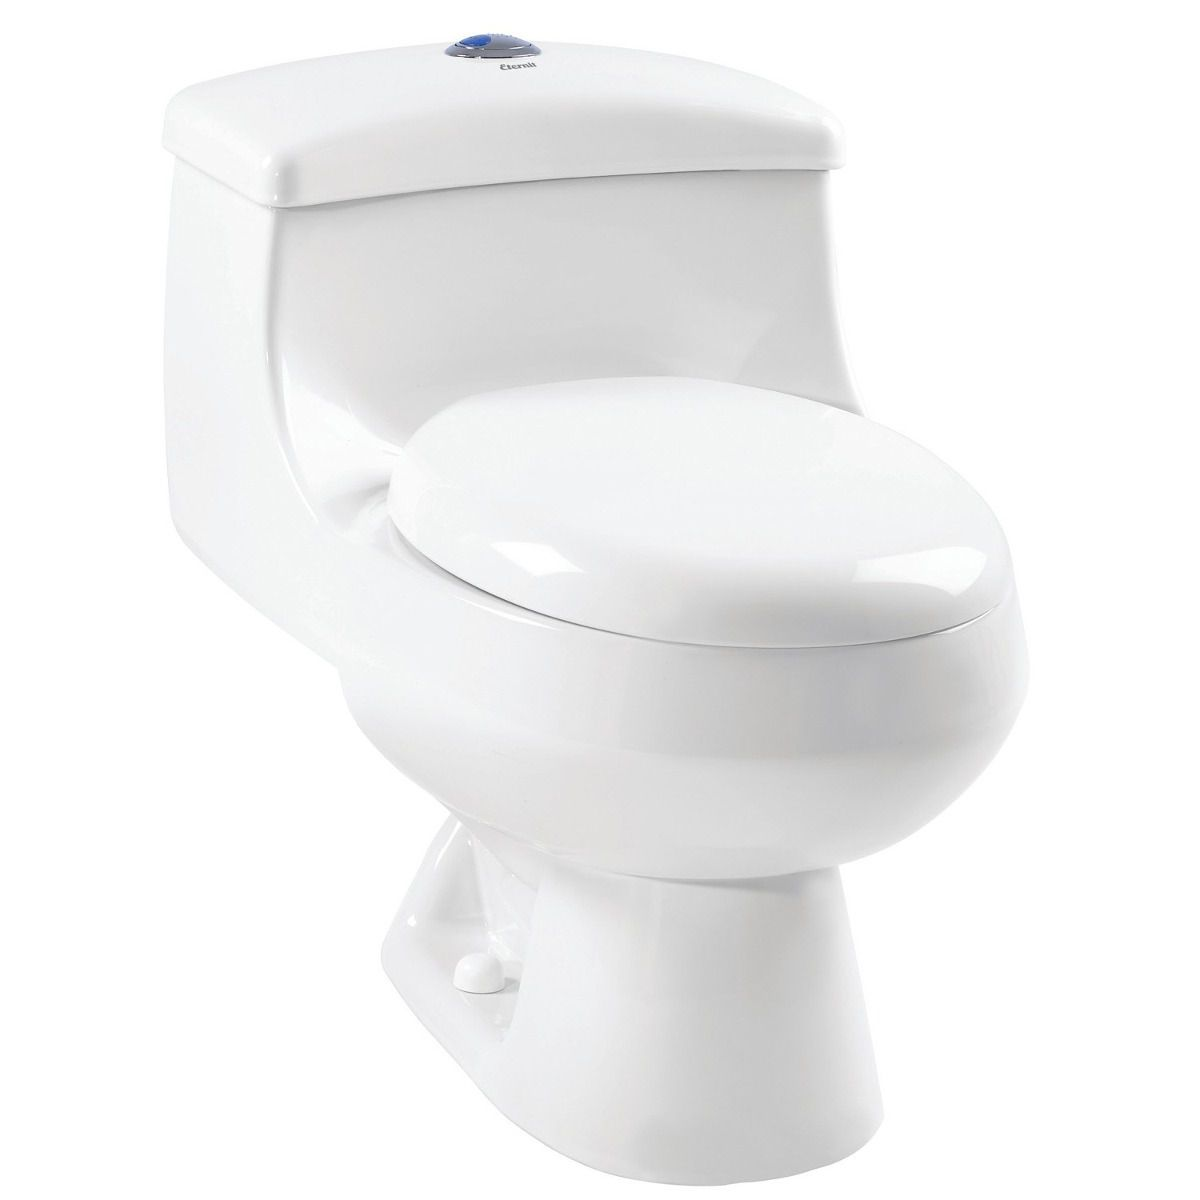 Assento Sanitário Slow Down Mona Branco Eternit